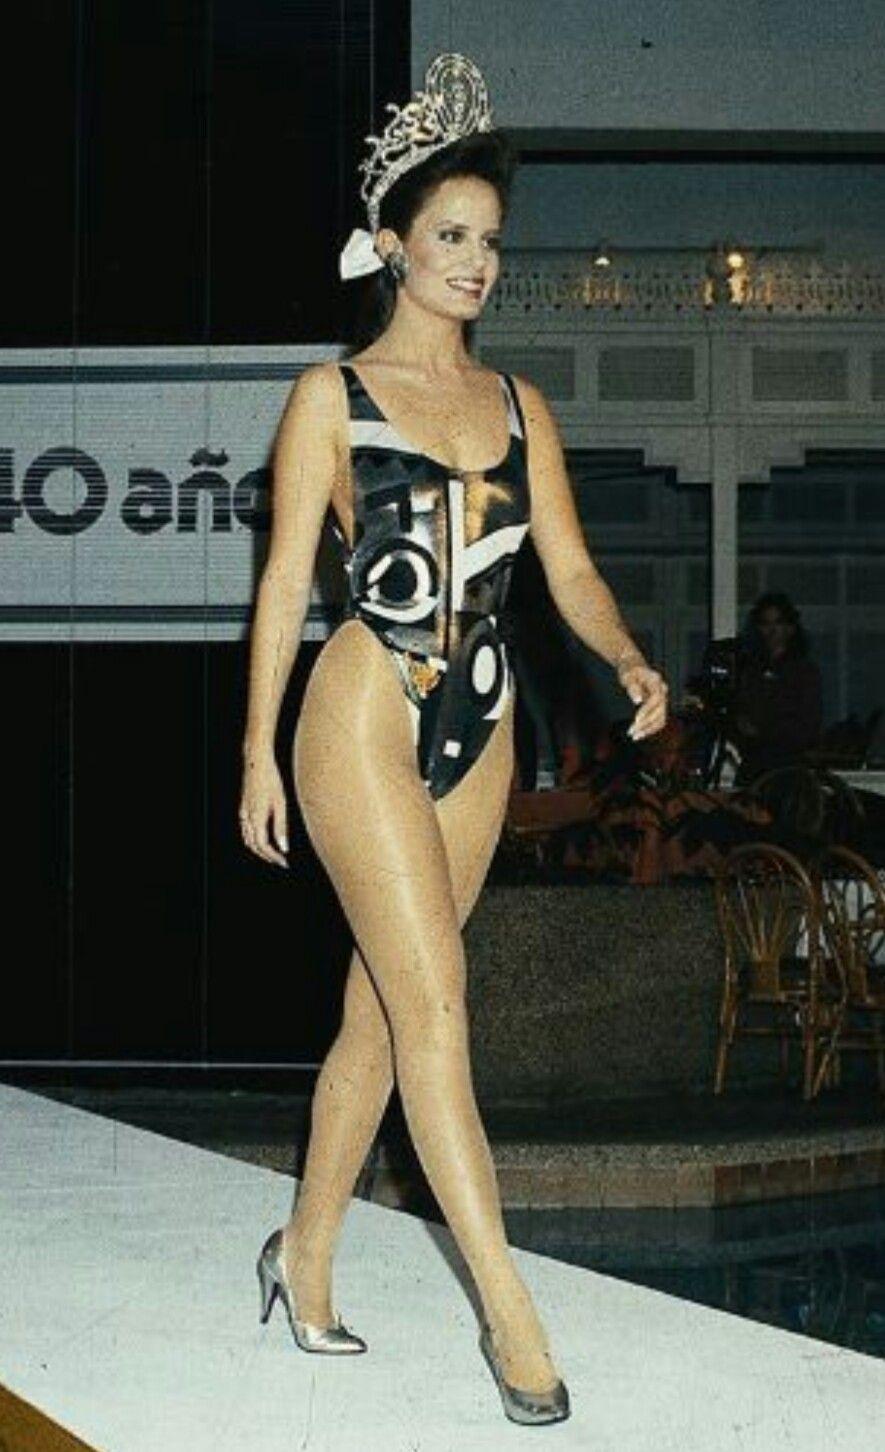 cecilia bolocco, miss universe 1987. - Página 5 Bb2dfa10